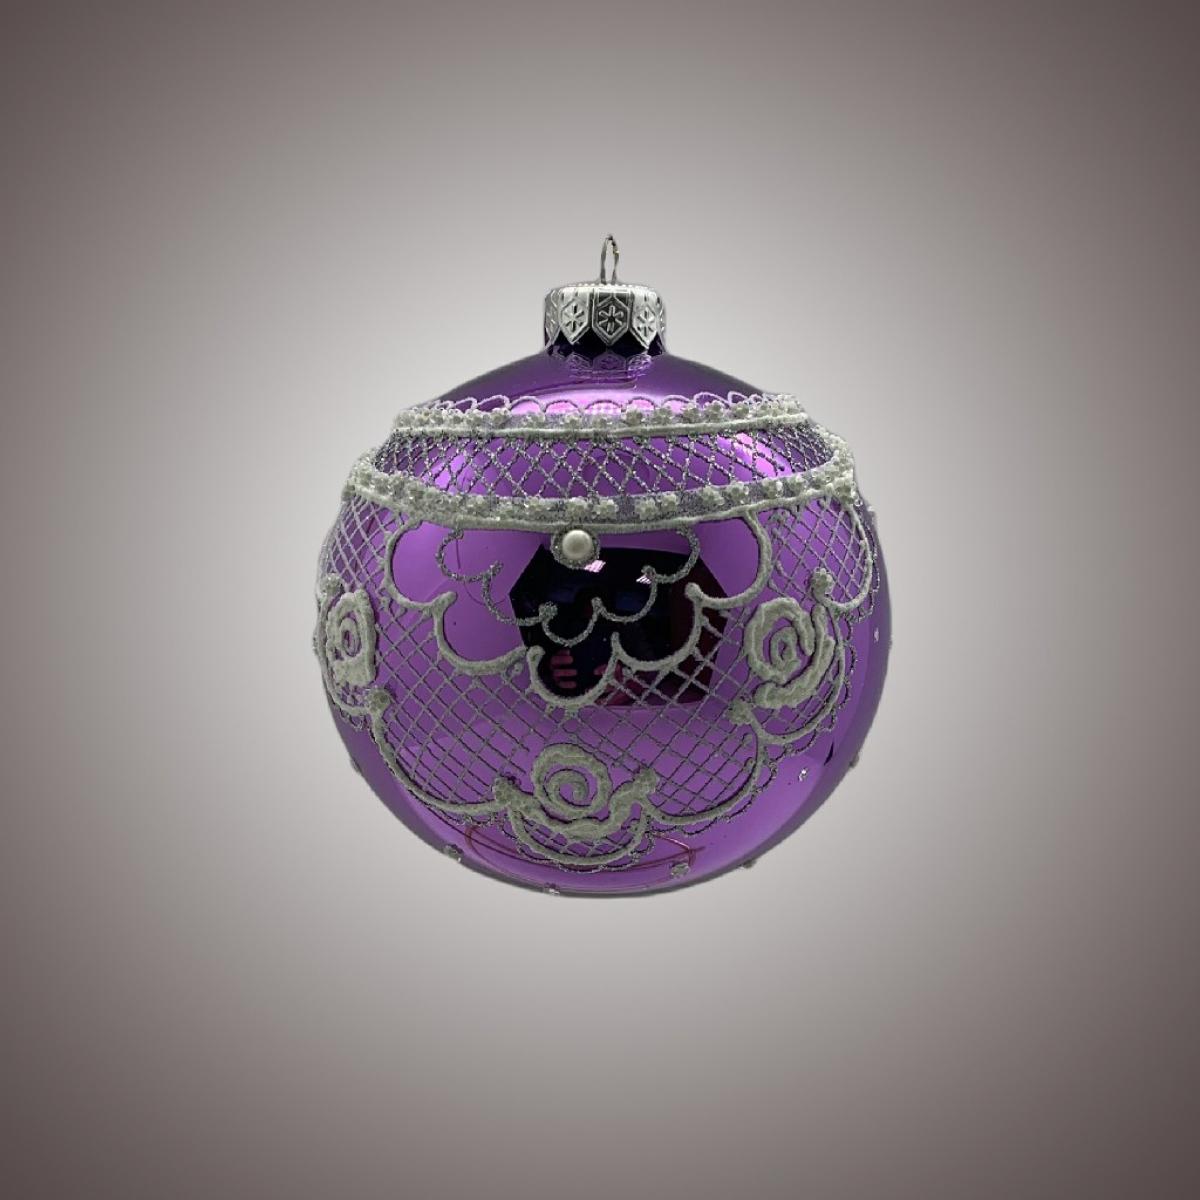 Шар Д 100 в инд.упак. Кружево на фиолетовом АРТ 91541